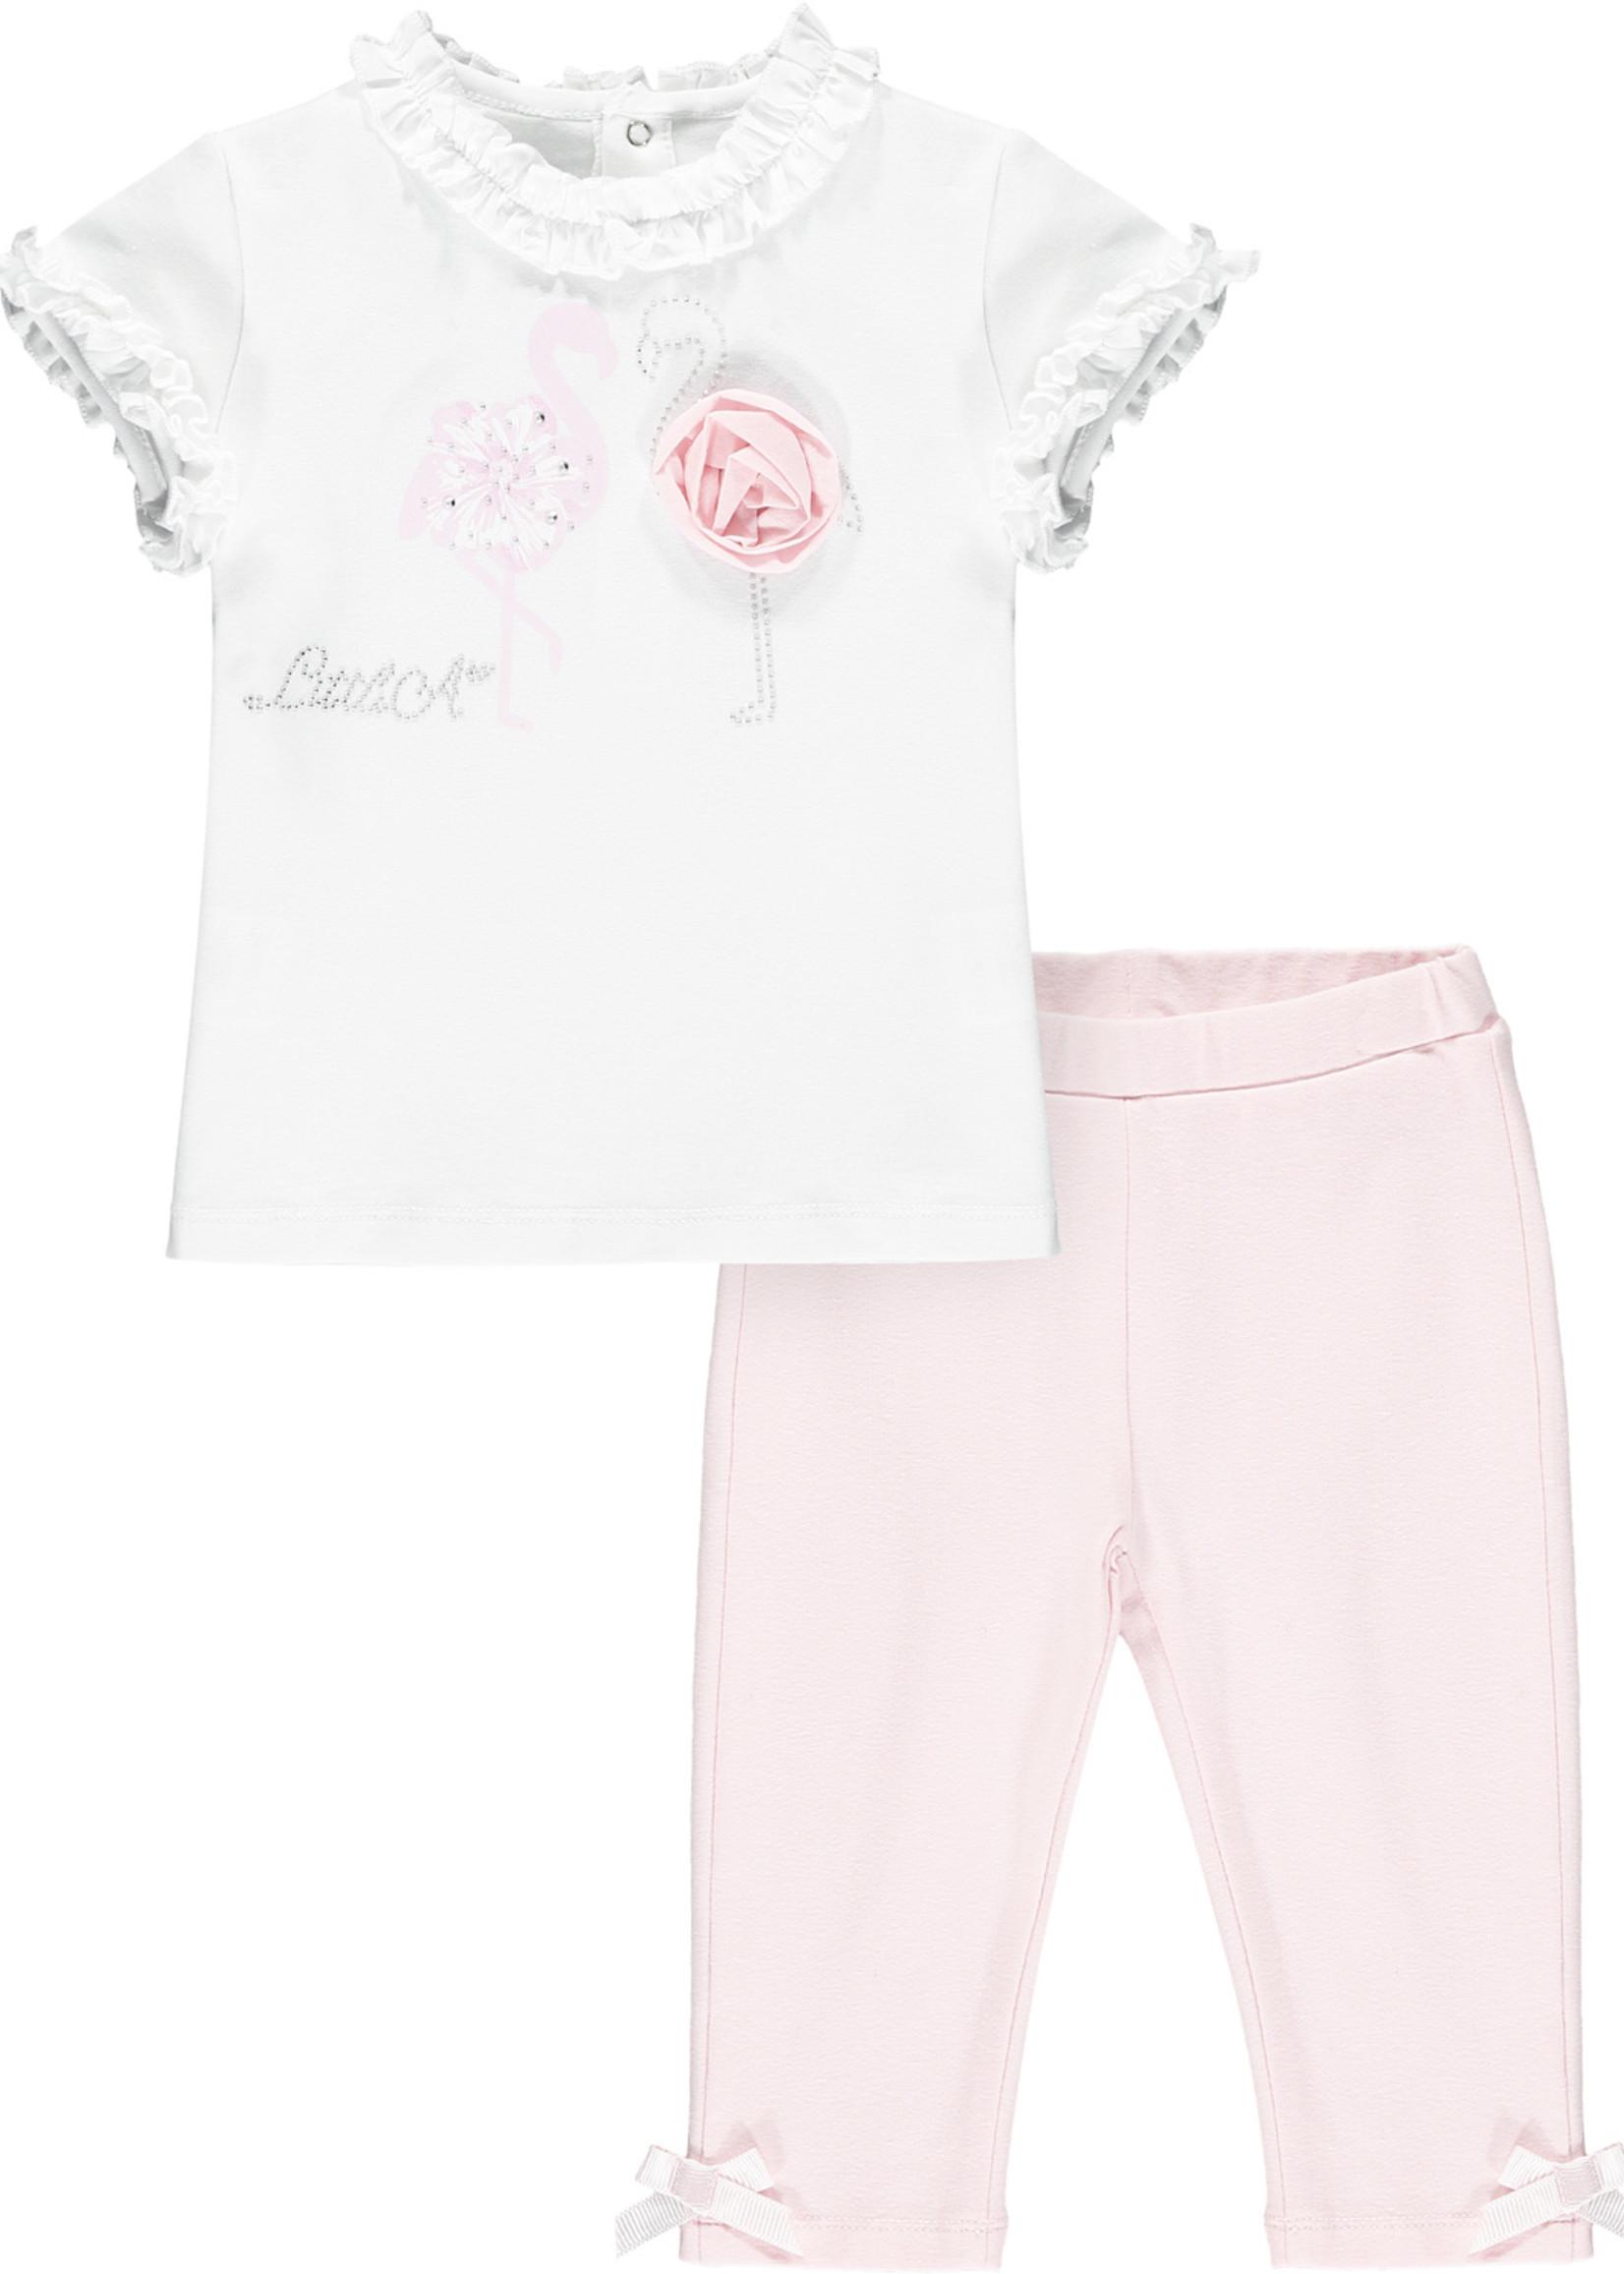 Little Adee Jade white flamingo top legging set